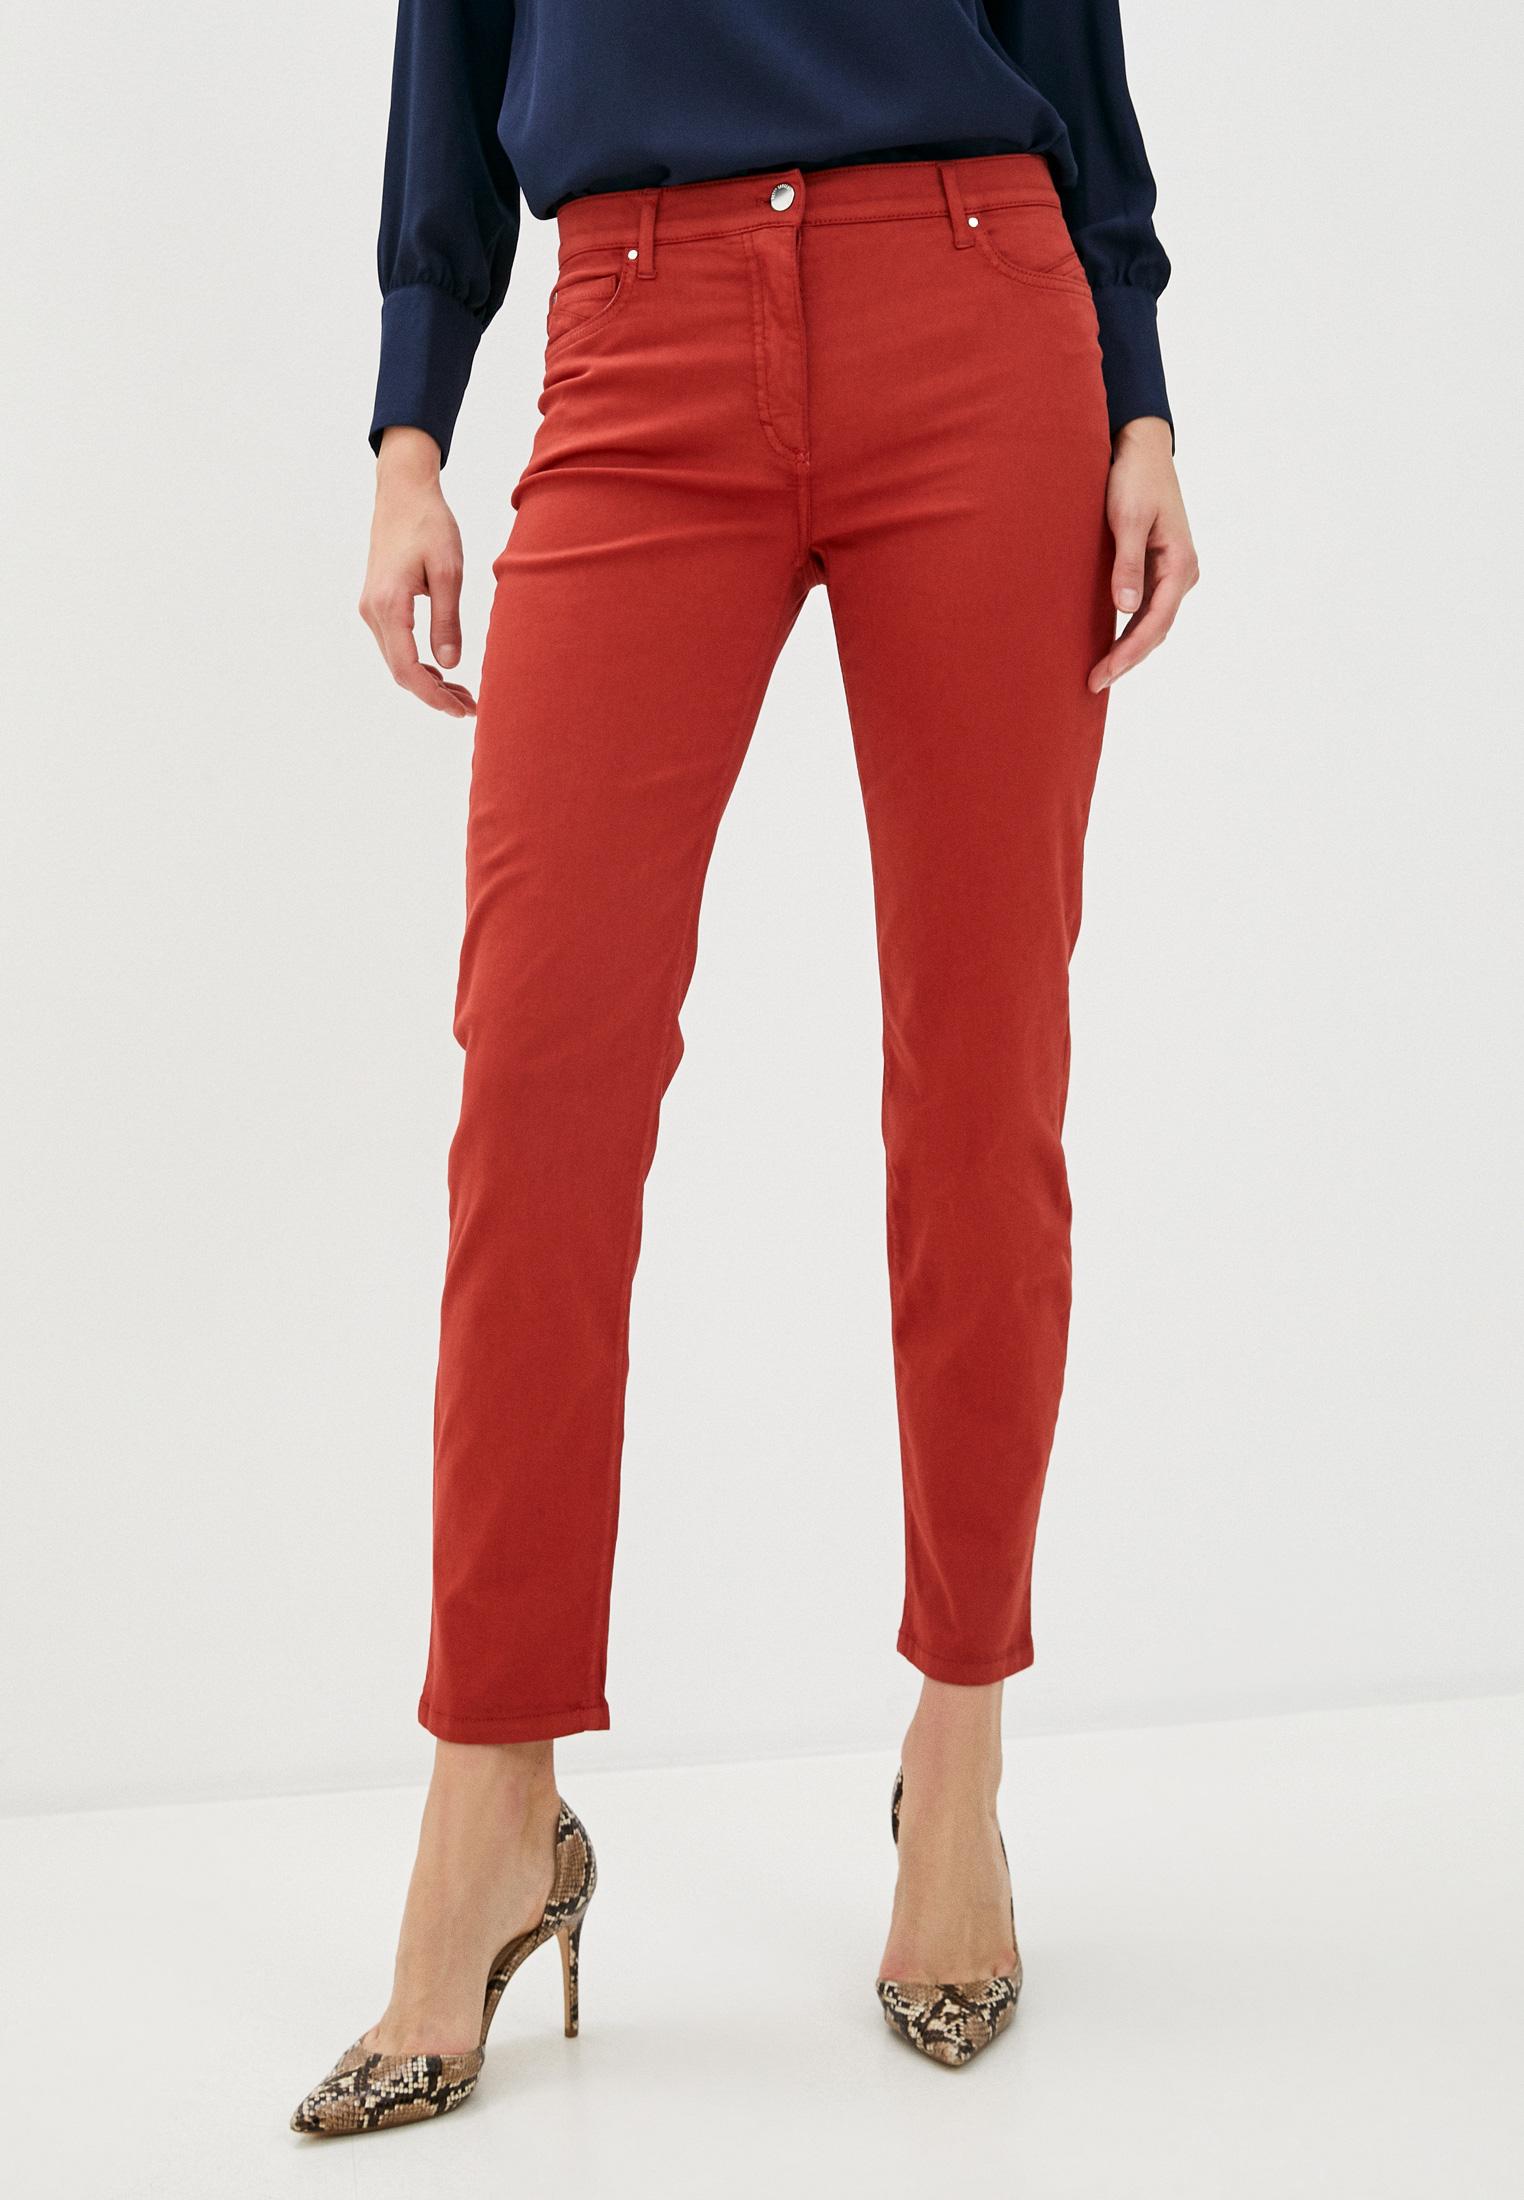 Женские прямые брюки Betty Barclay 6143/1201